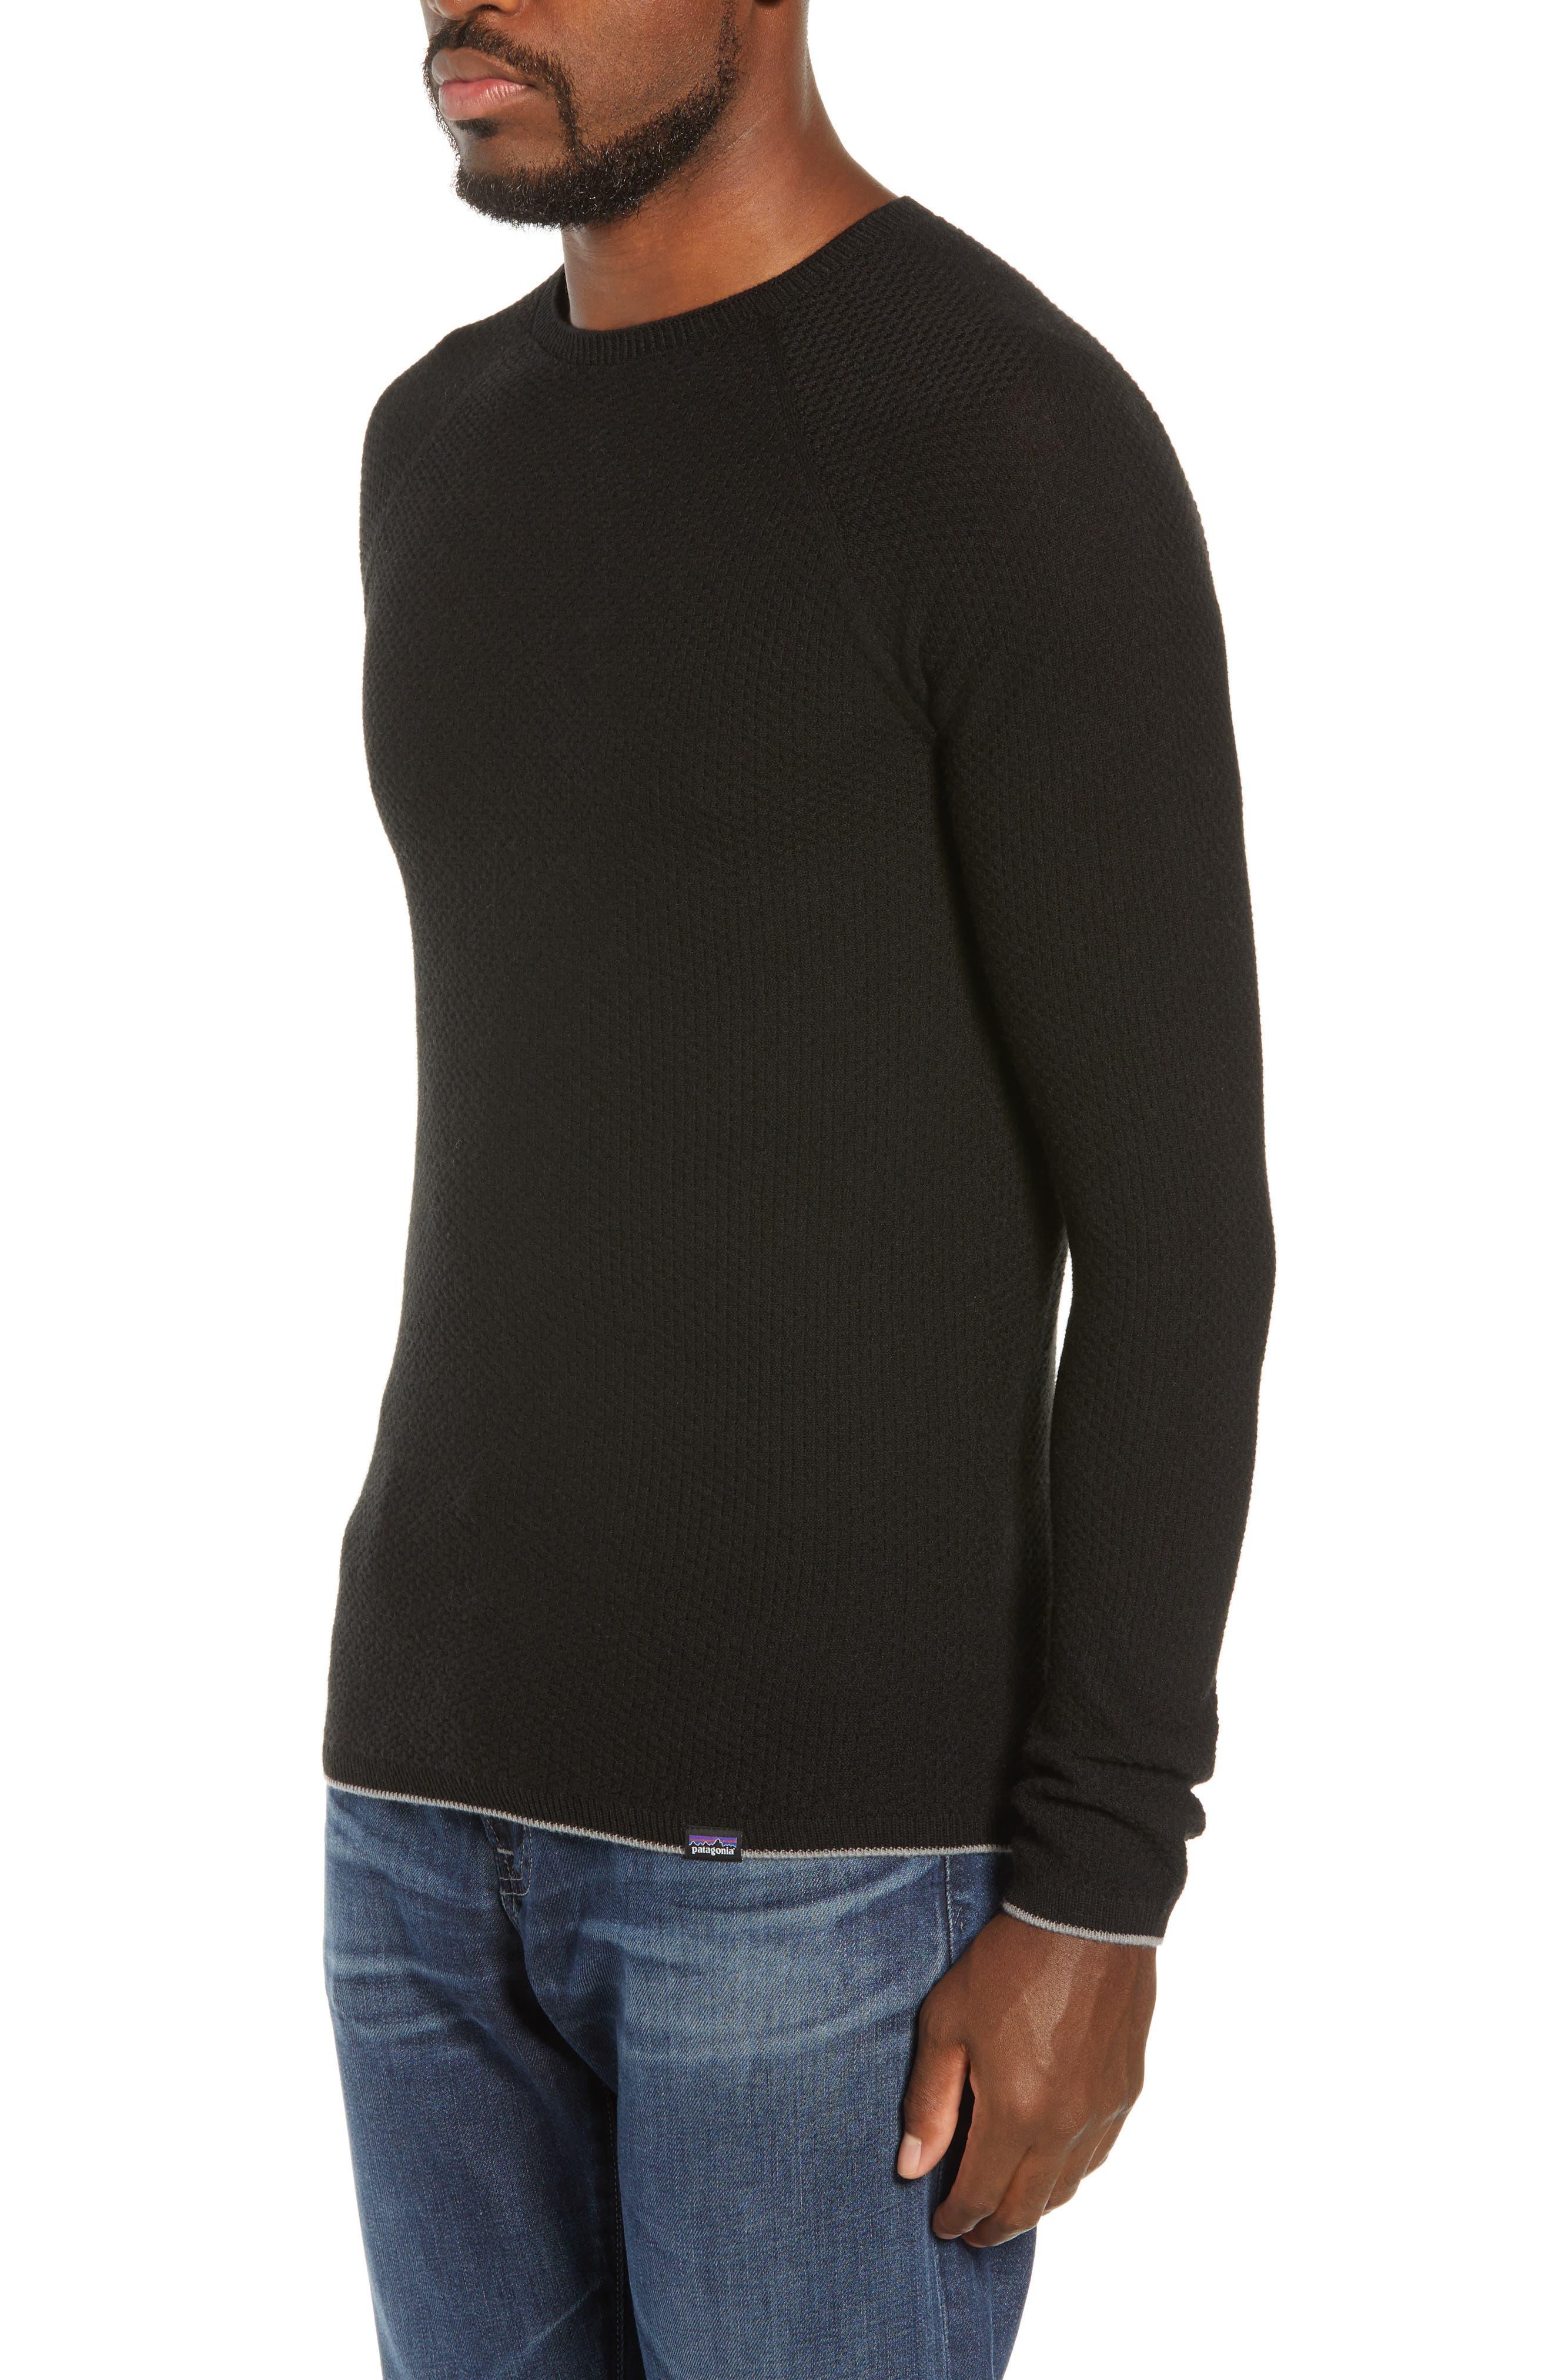 Capilene<sup>®</sup> Lightweight Air Crew Sweater,                             Alternate thumbnail 3, color,                             BLACK